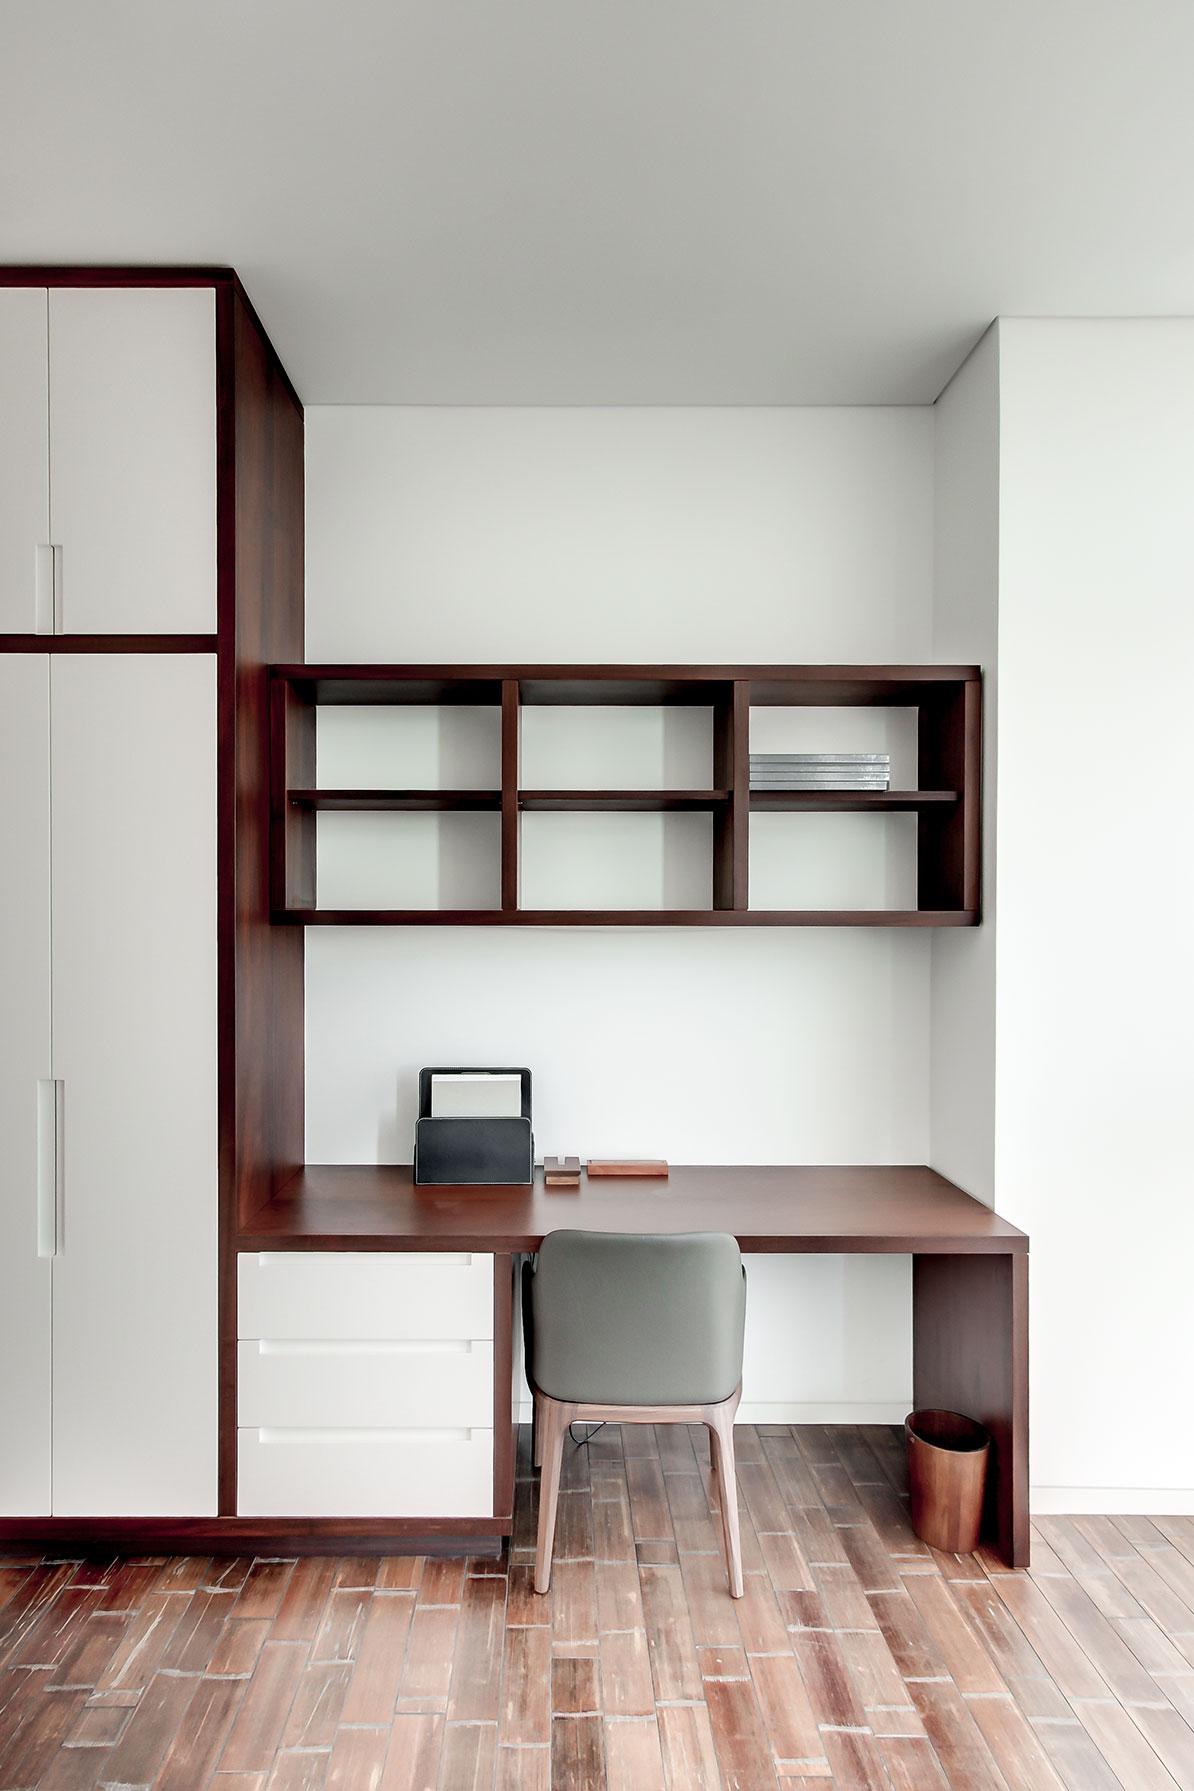 asaf lerman 225 apartment tel aviv10 Penthouse in Tel Aviv by Asaf Lerman Architects